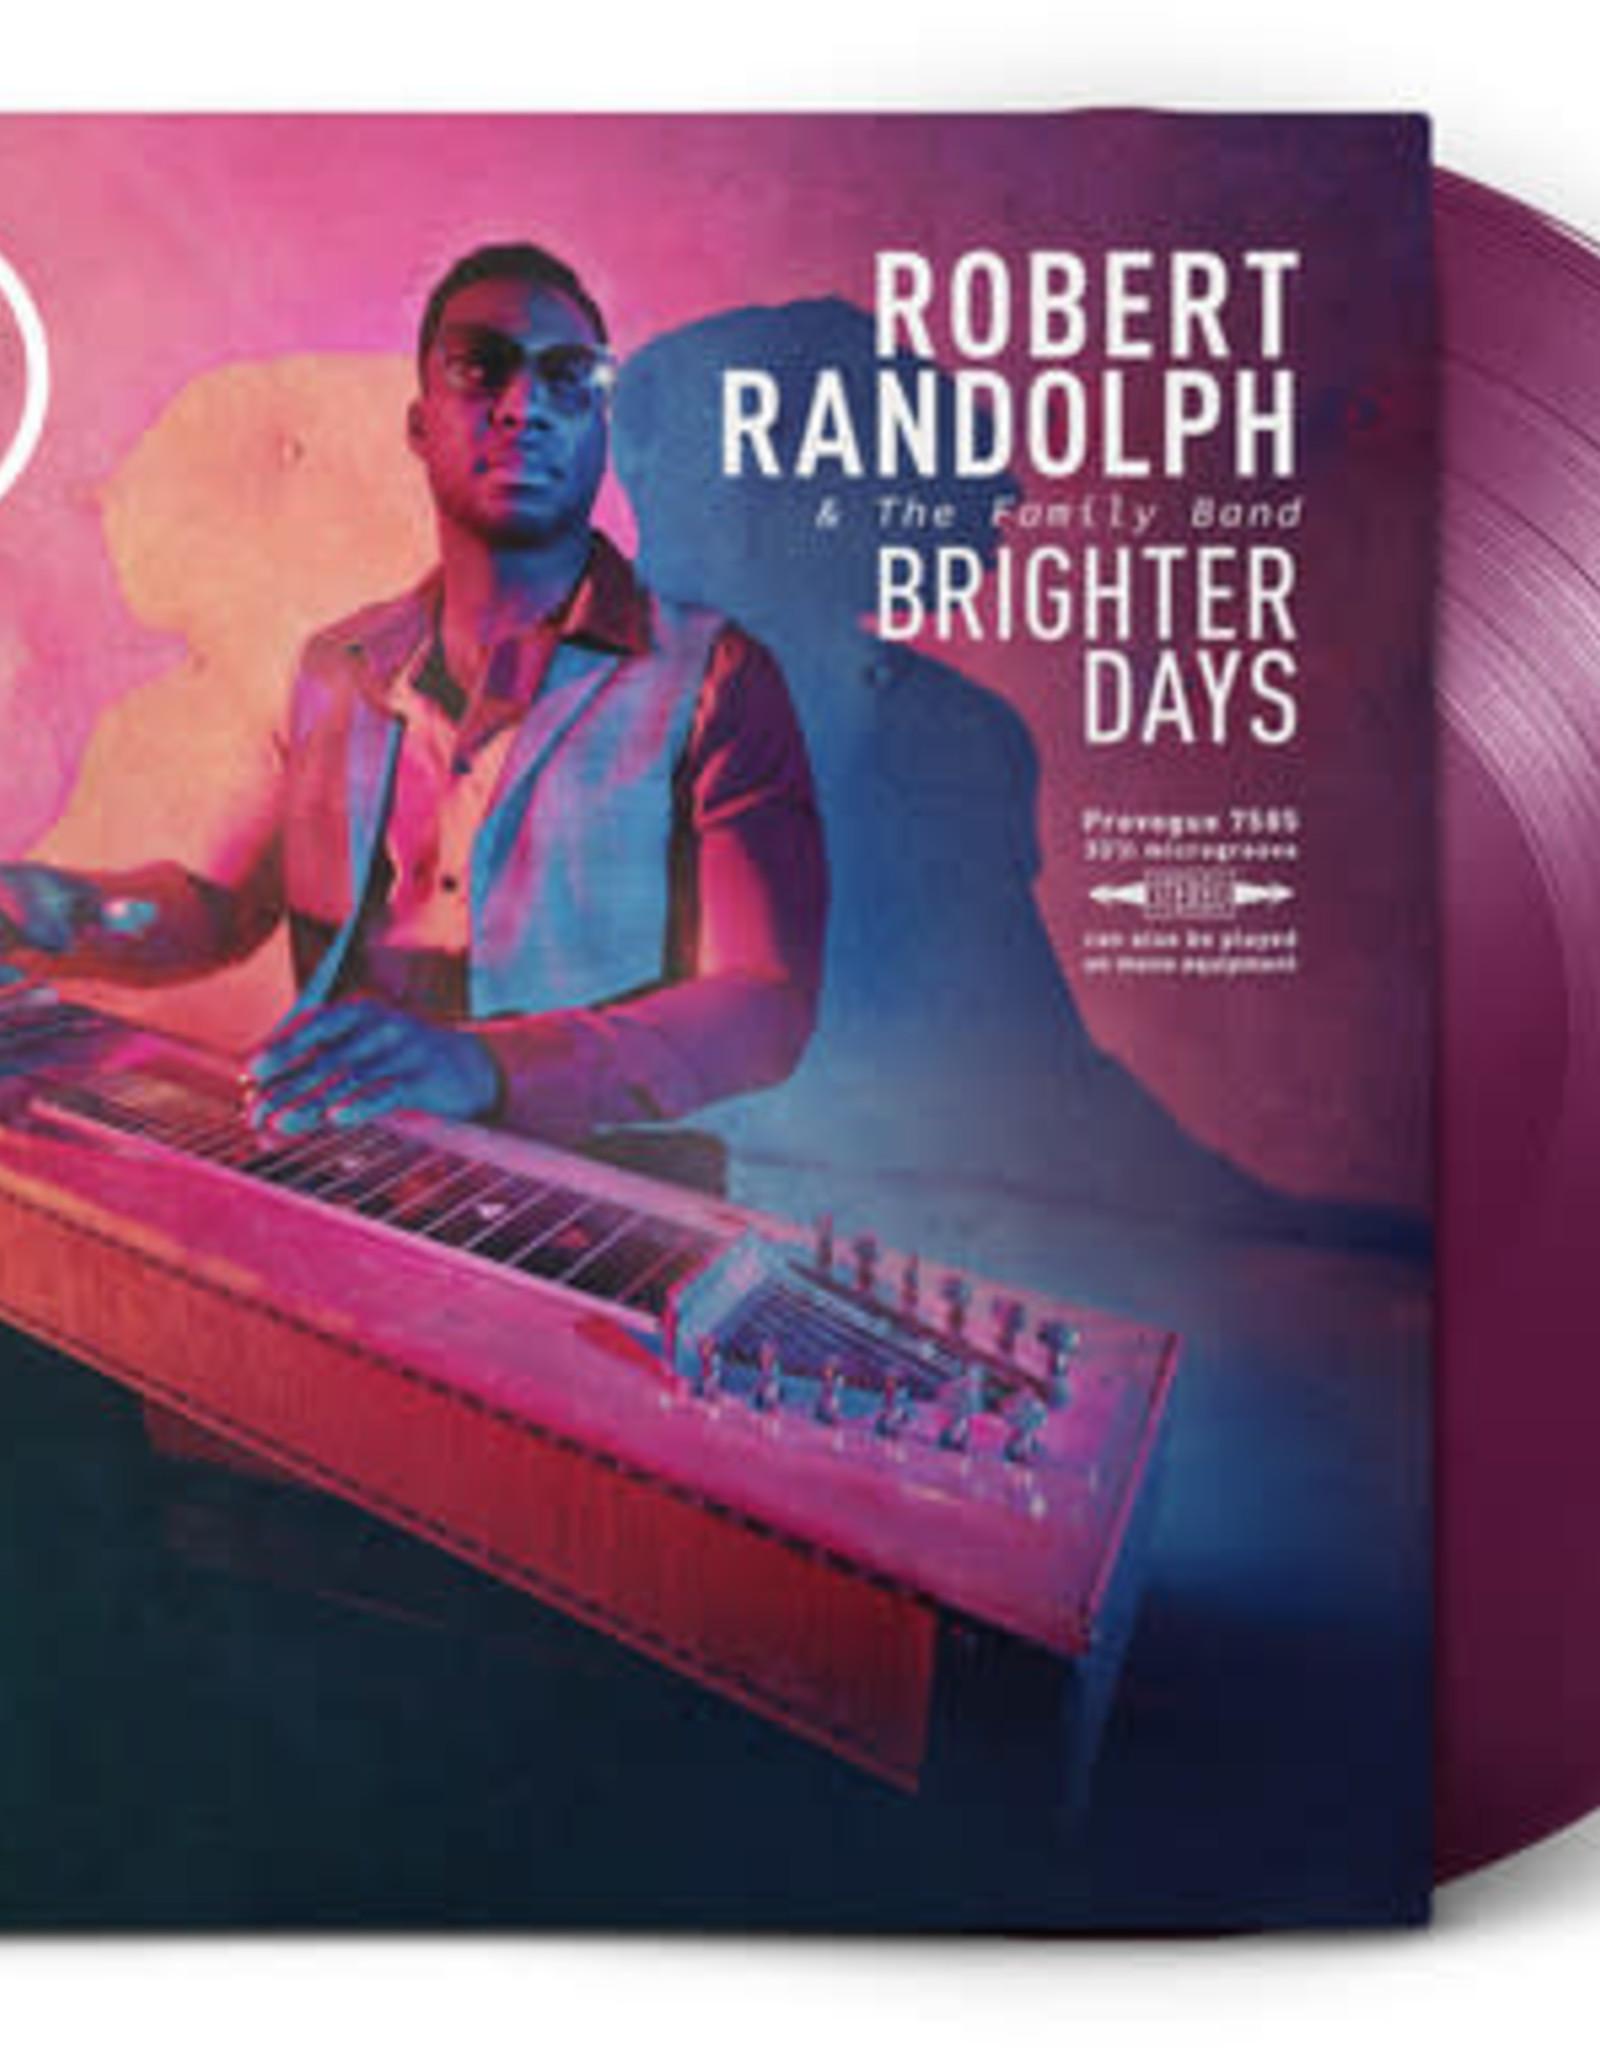 Robert Randolph & The Family - Brighter Days